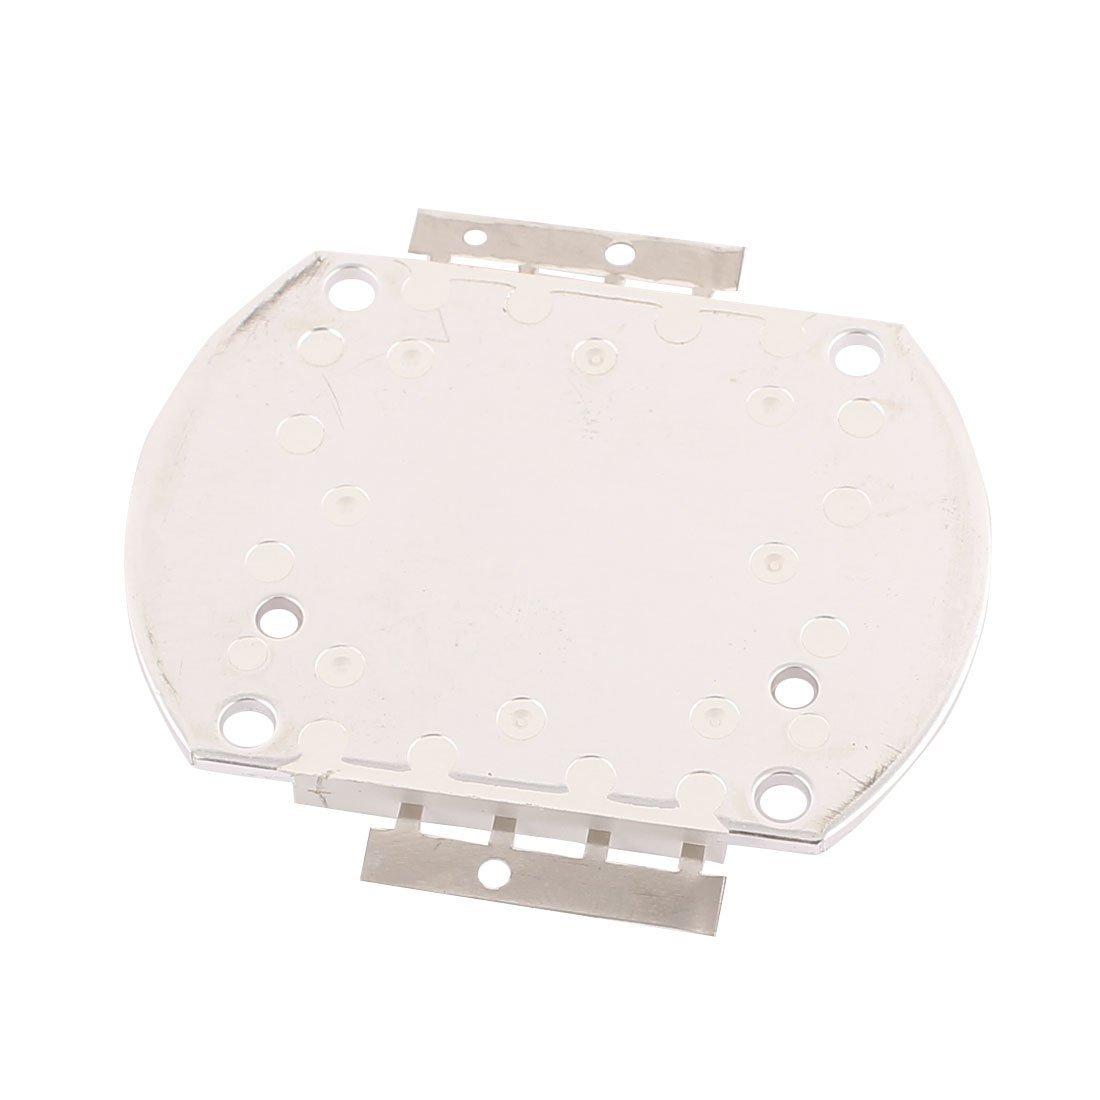 eDealMax 30-34V 30W viruta del LED del bulbo blanco cálido super brillante de alta potencia para Proyector - - Amazon.com